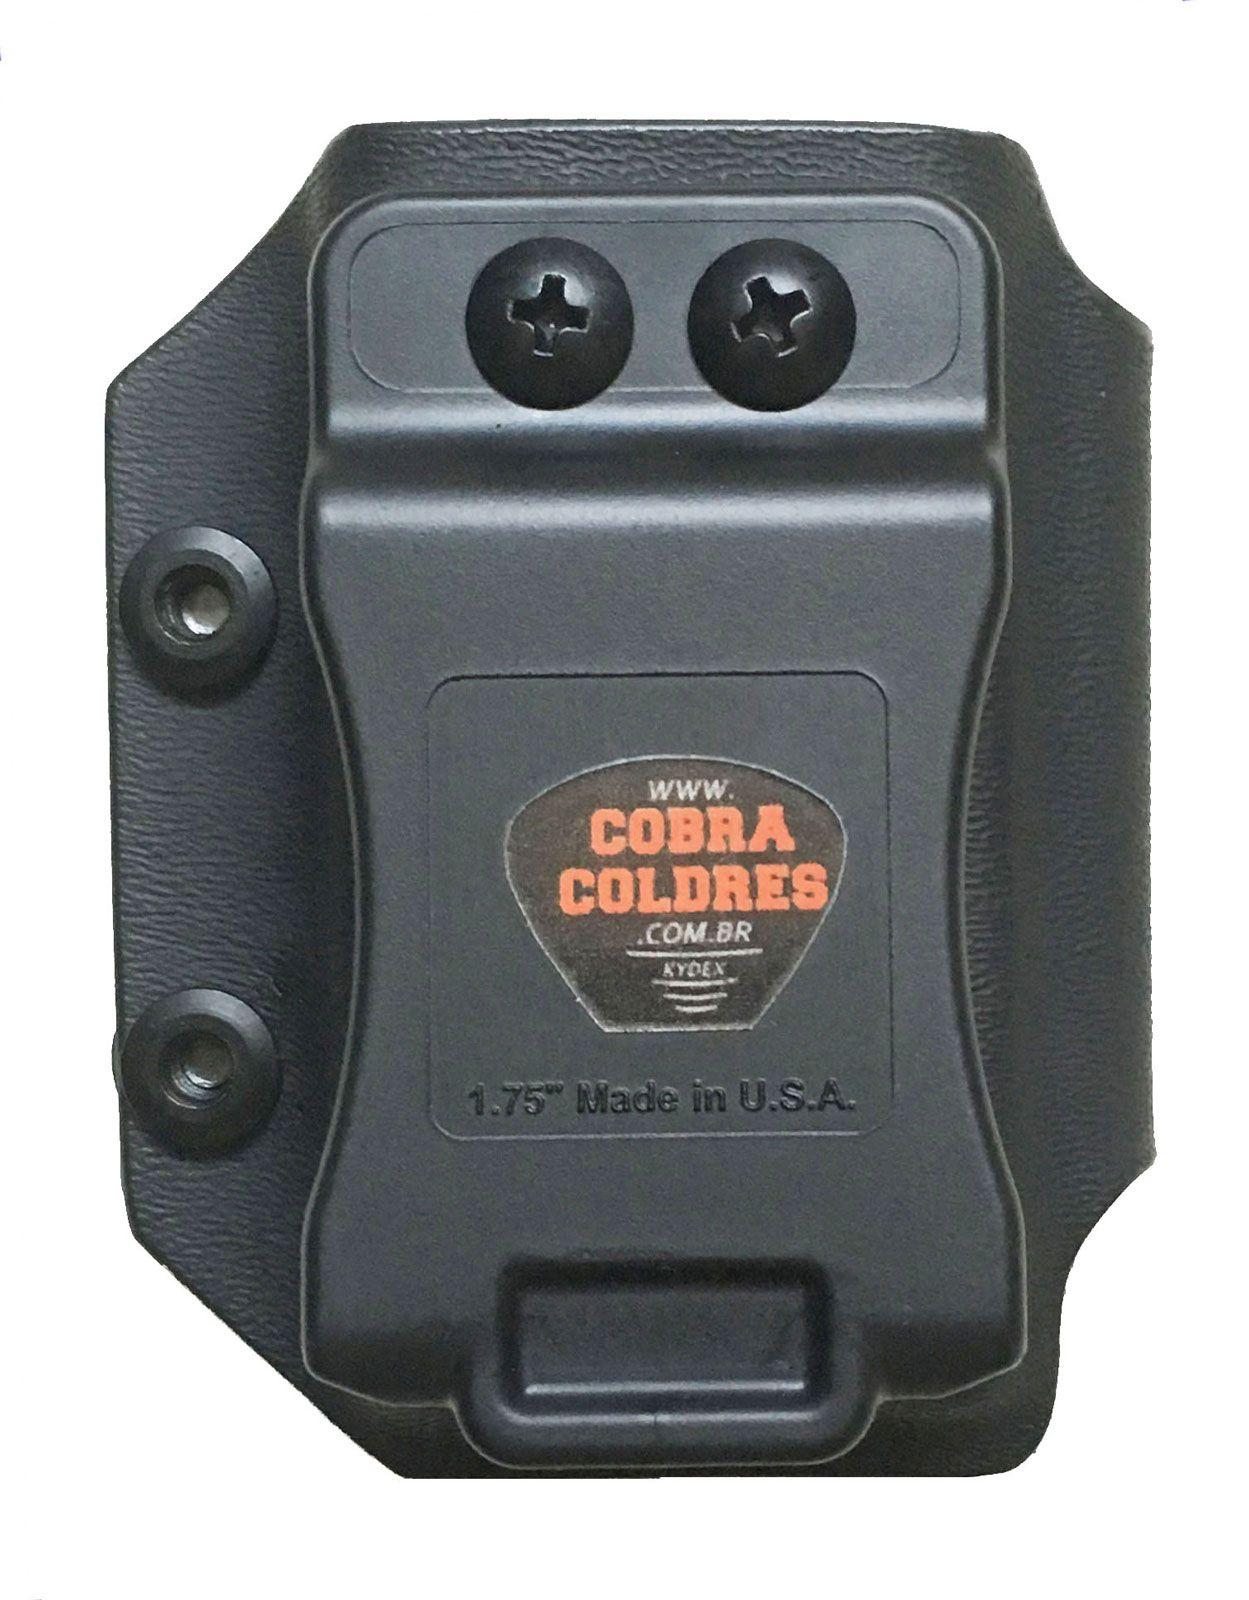 Coldre [G2c] .40 Kydex Slim + 2 Porta-Carregadores - Saque Rápido Velado Kydex® 080